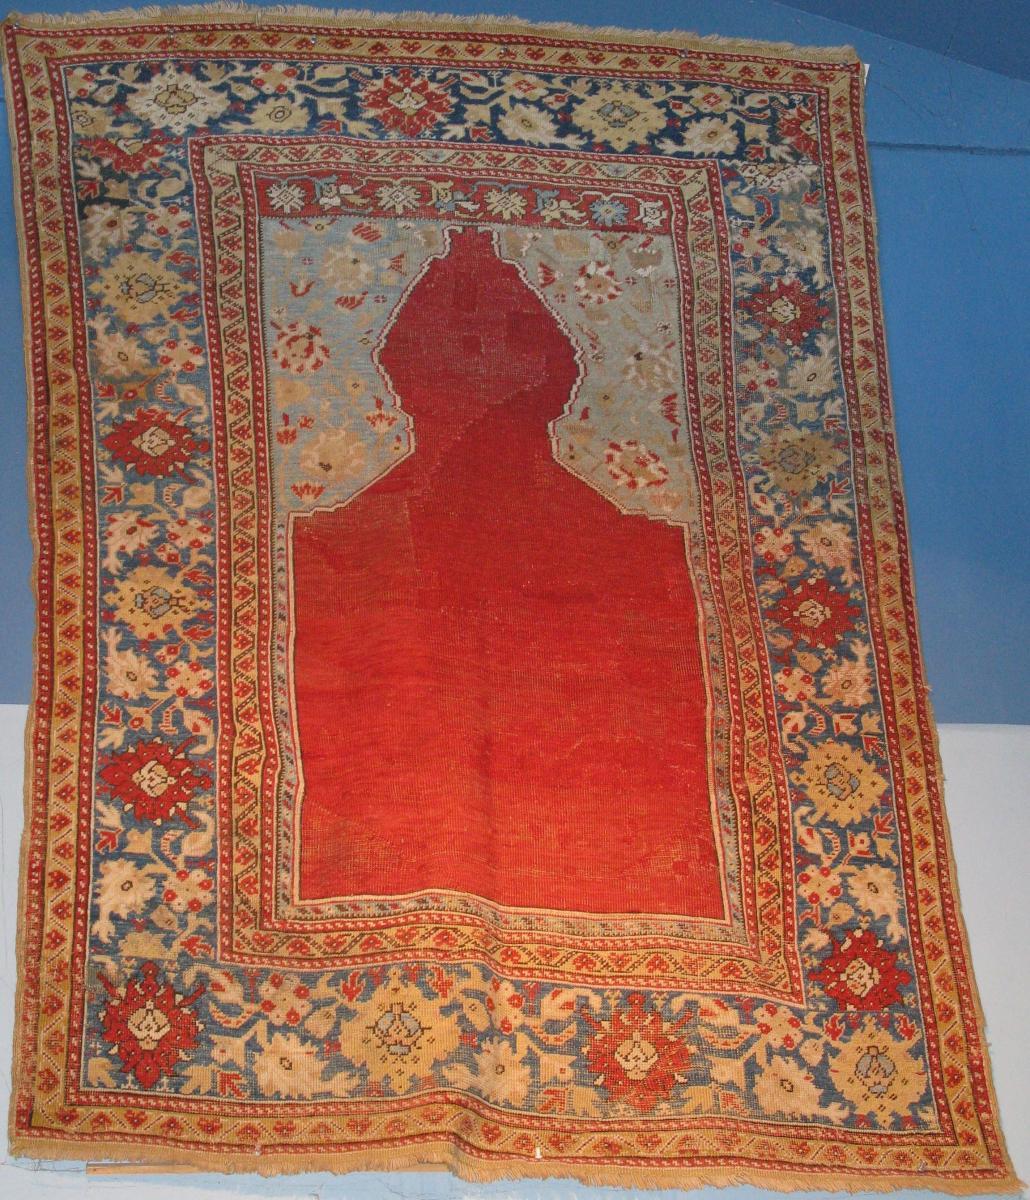 Transylvanian Prayer Rug Kula Melas